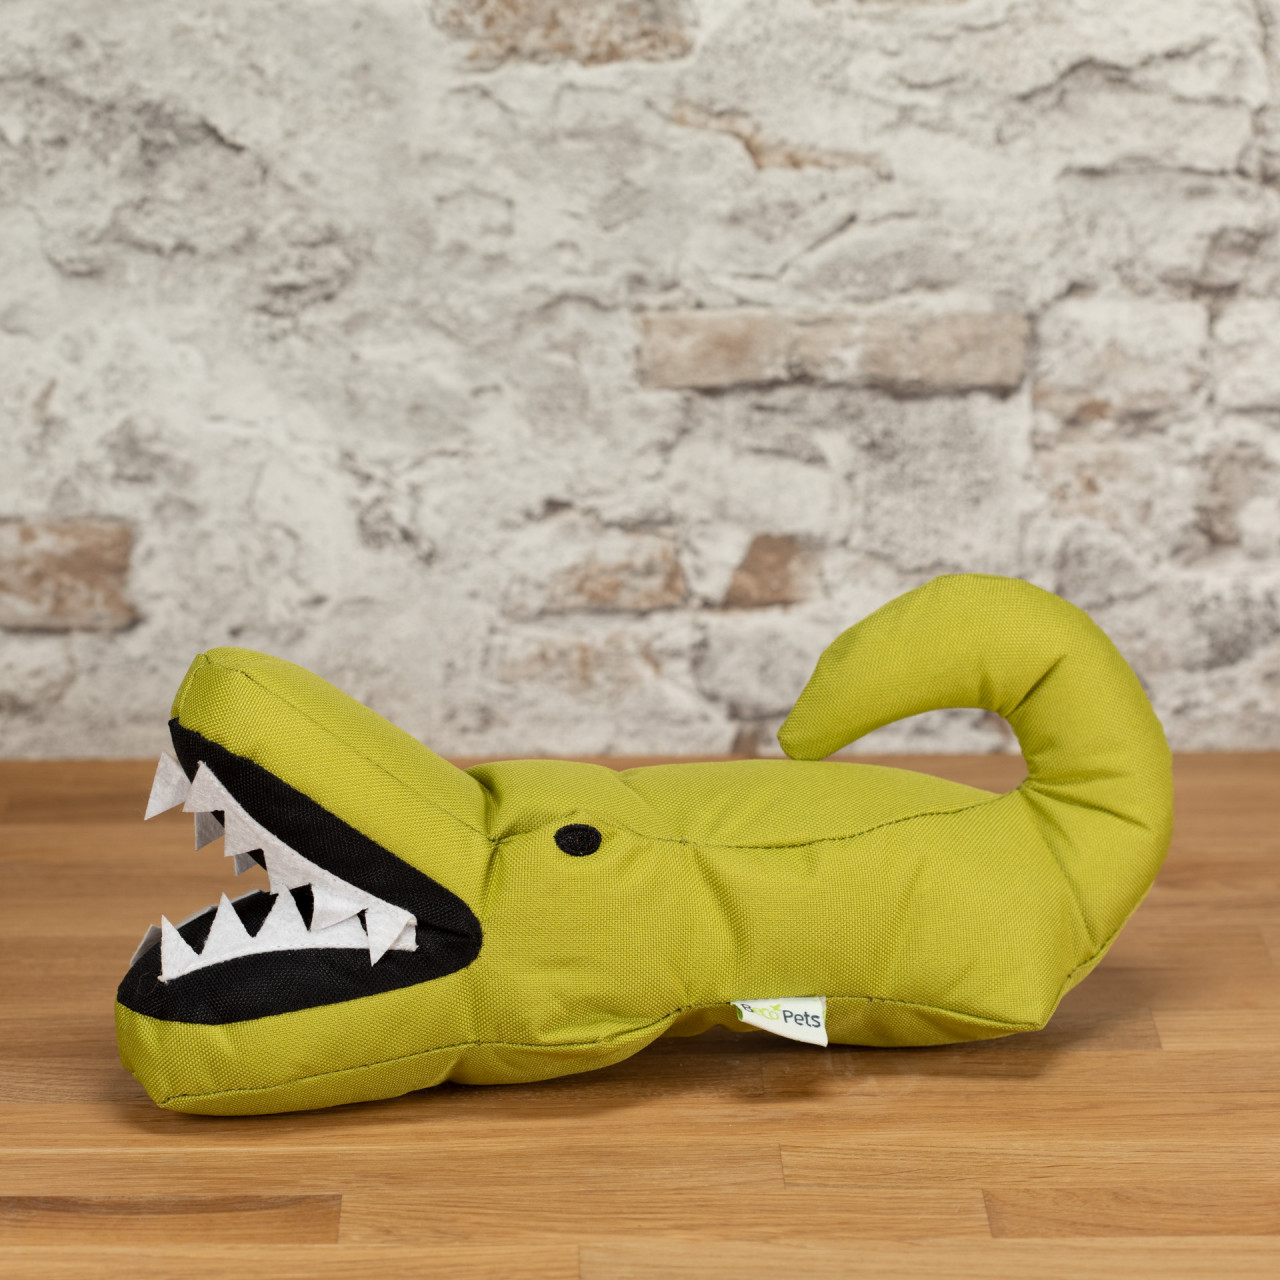 Hundespielzeug Aretha, das Krokodil